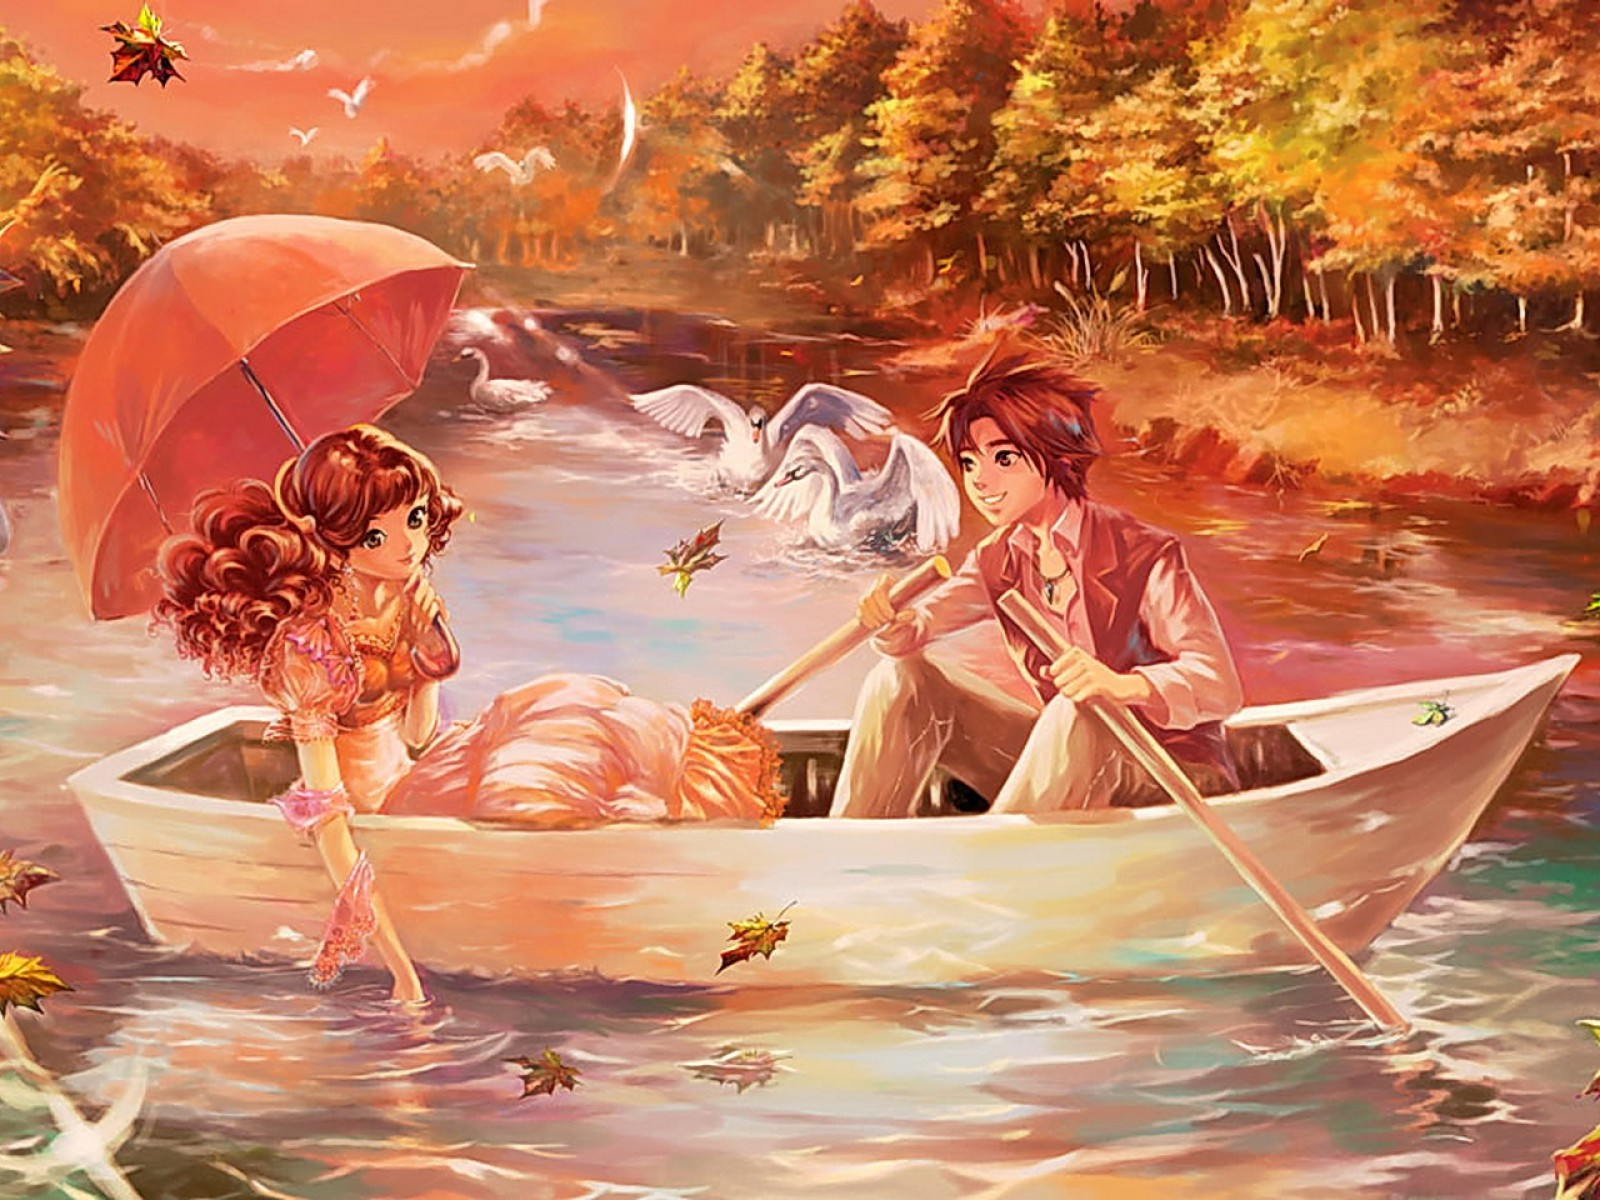 Anime - Unknown  Wallpaper